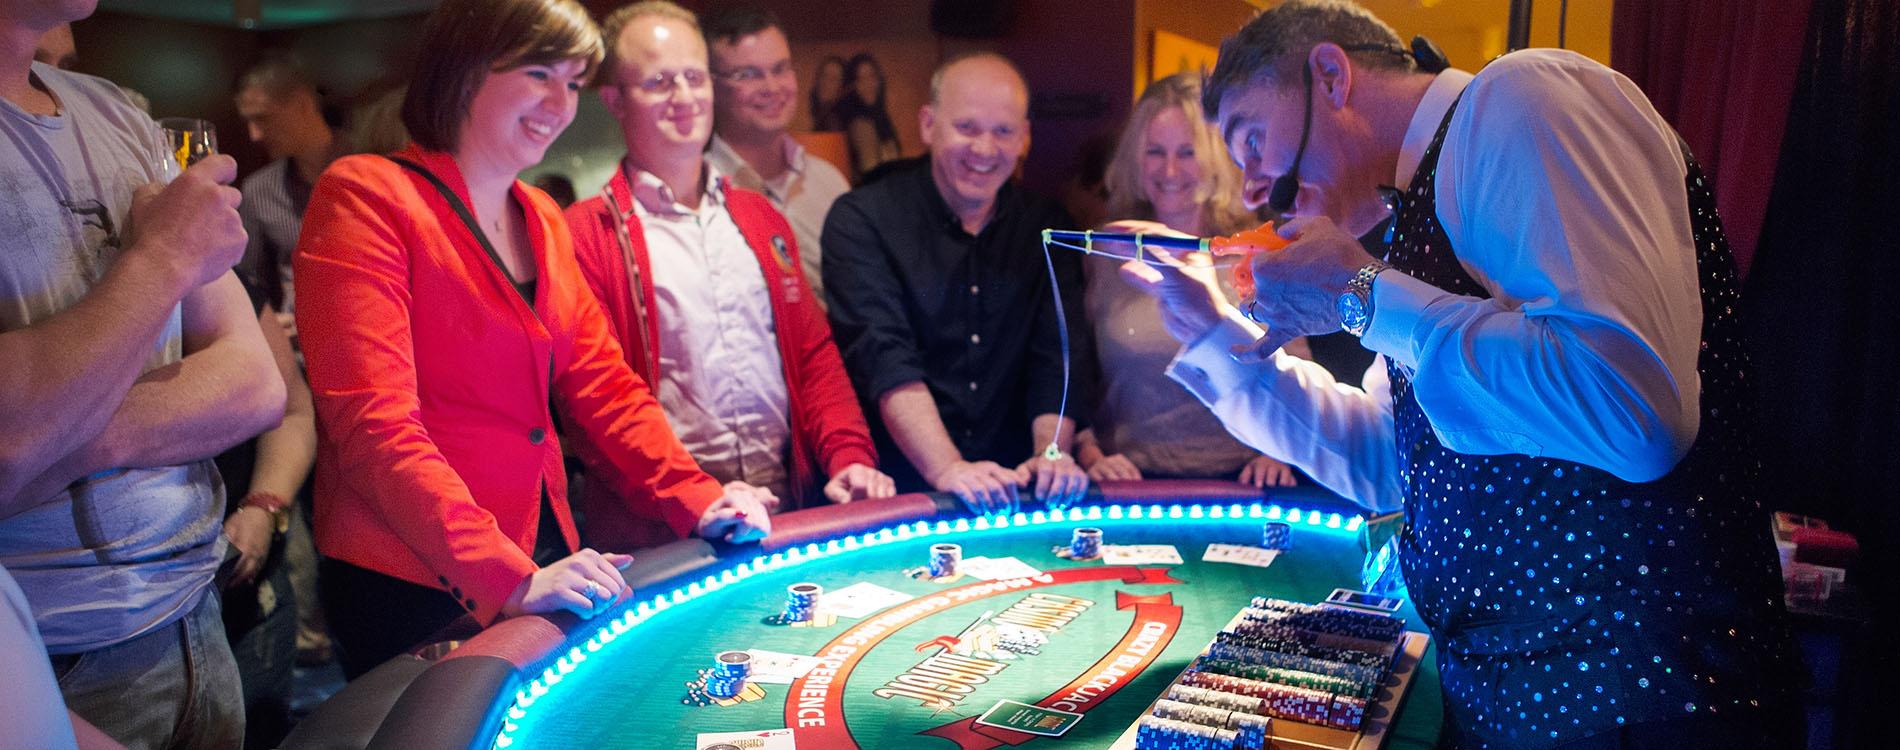 Casino Magic entertainment gigworld HEADER 1